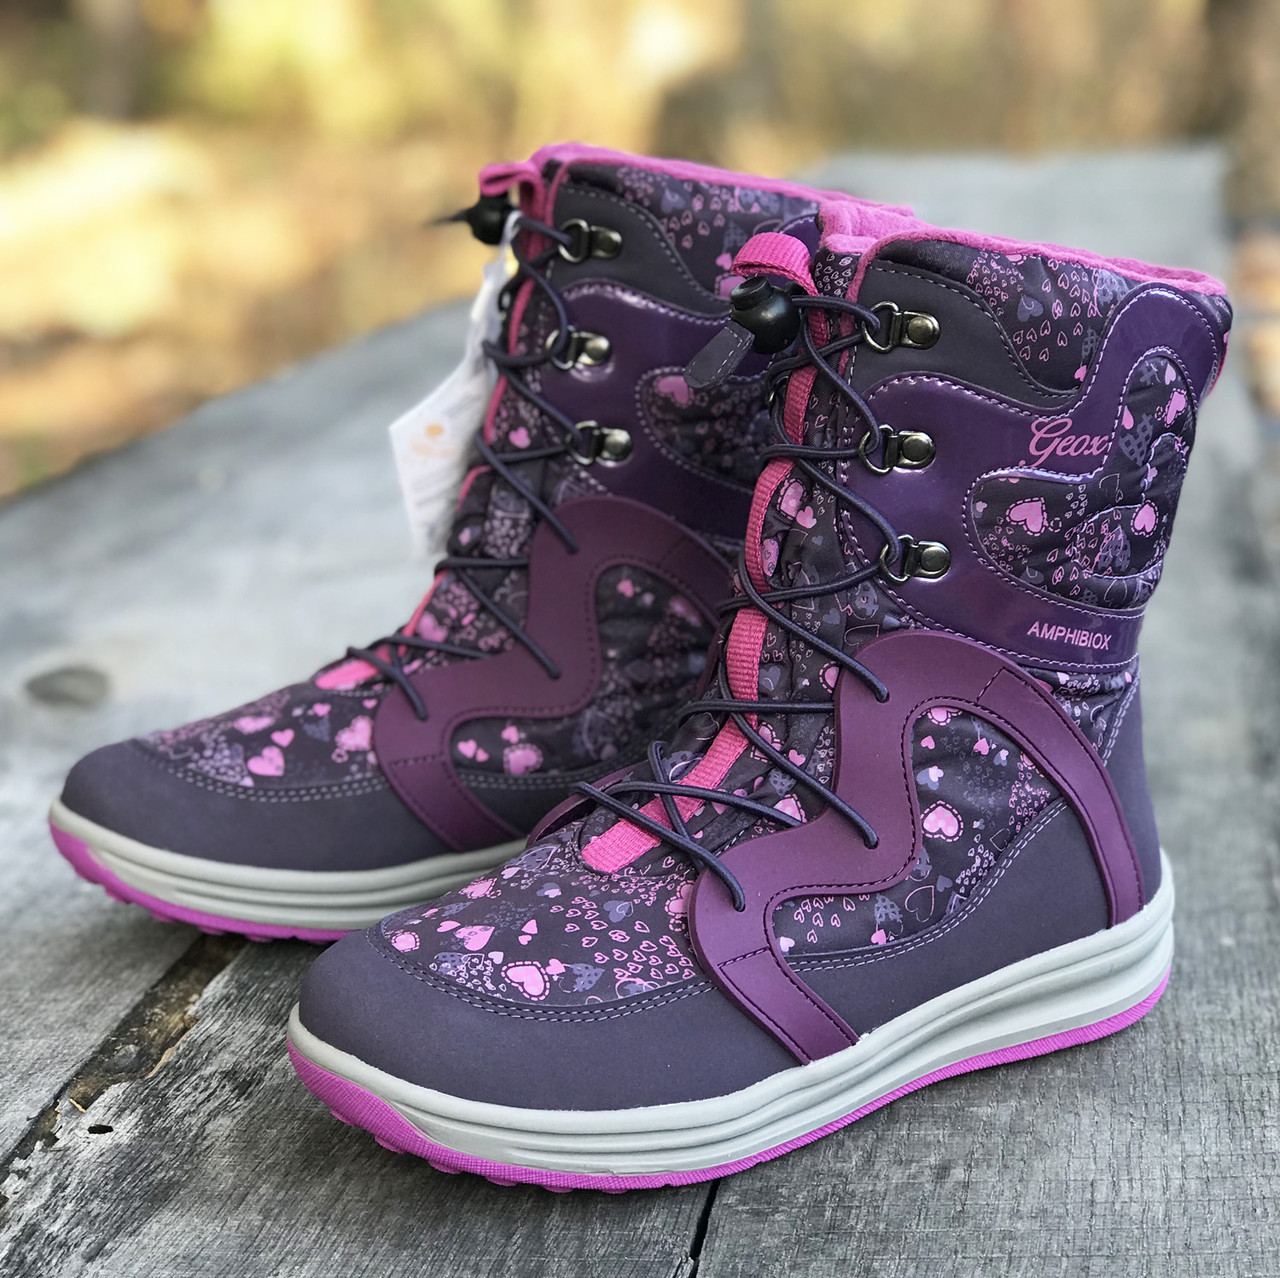 a5189bff2 Зимние ботинки Geox (Италия) J Roby р 38. зимняя обувь джеокс - Интернет